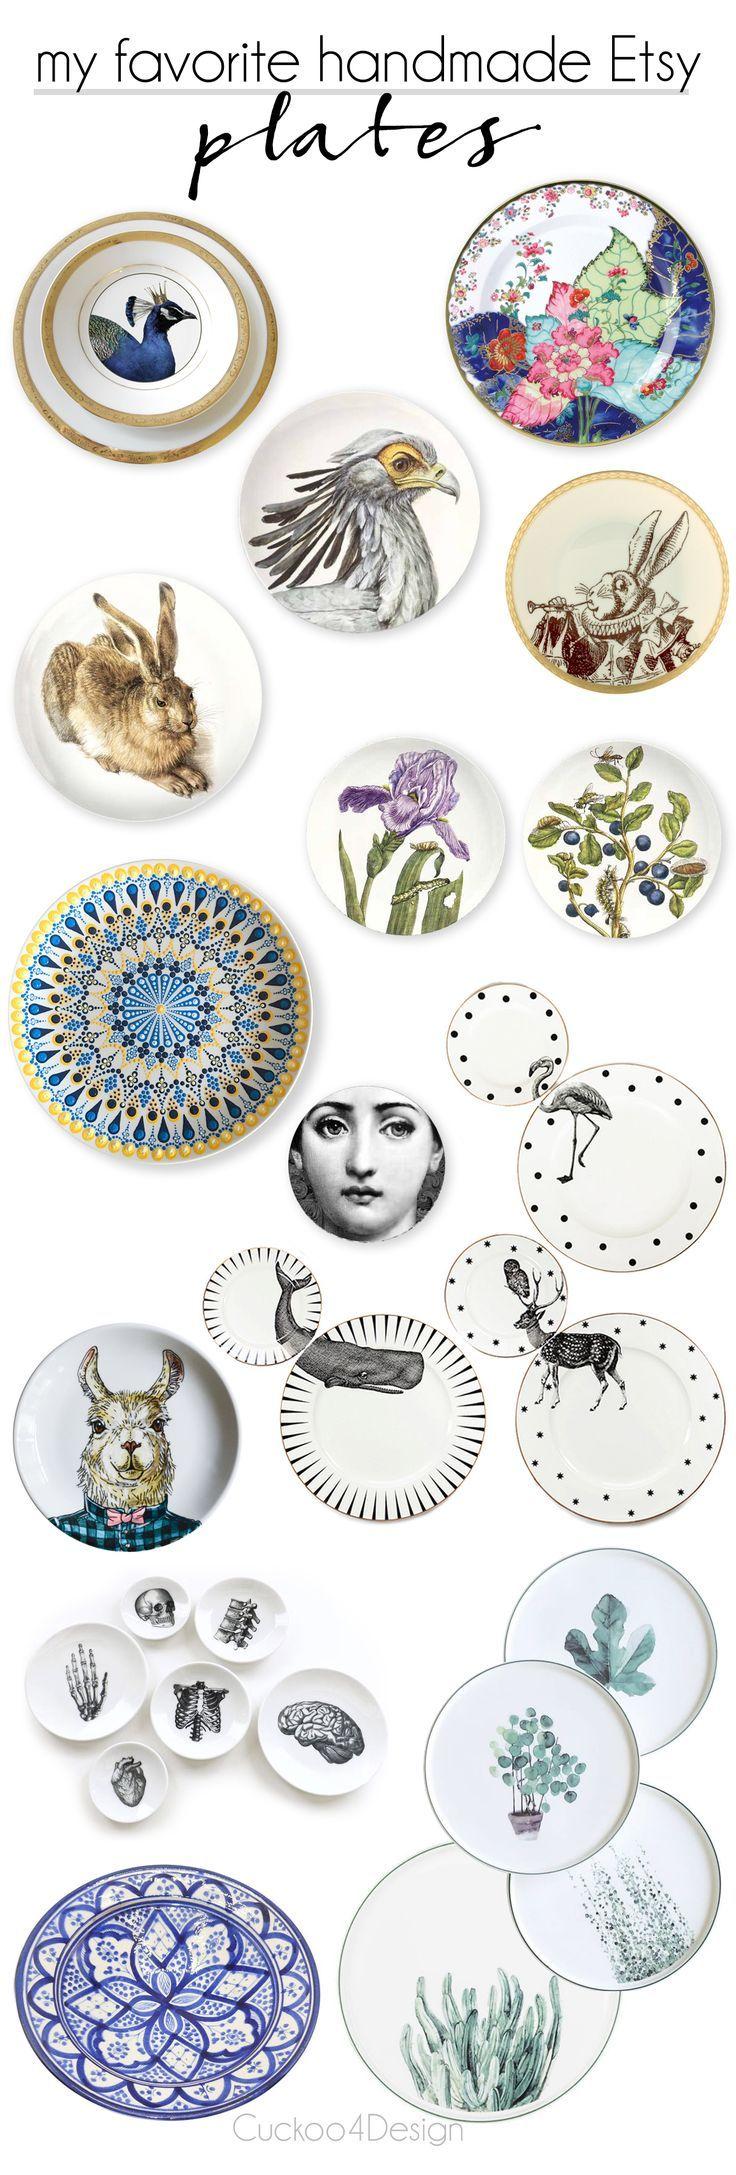 my favorite handmade plates on Etsy | plate gallery wall | handmade plates | botanical plates | Alice in Wonderland plates | anatomy plates | Moroccan plates | Indian plates | Dot Mandala Art plates via @jakonya